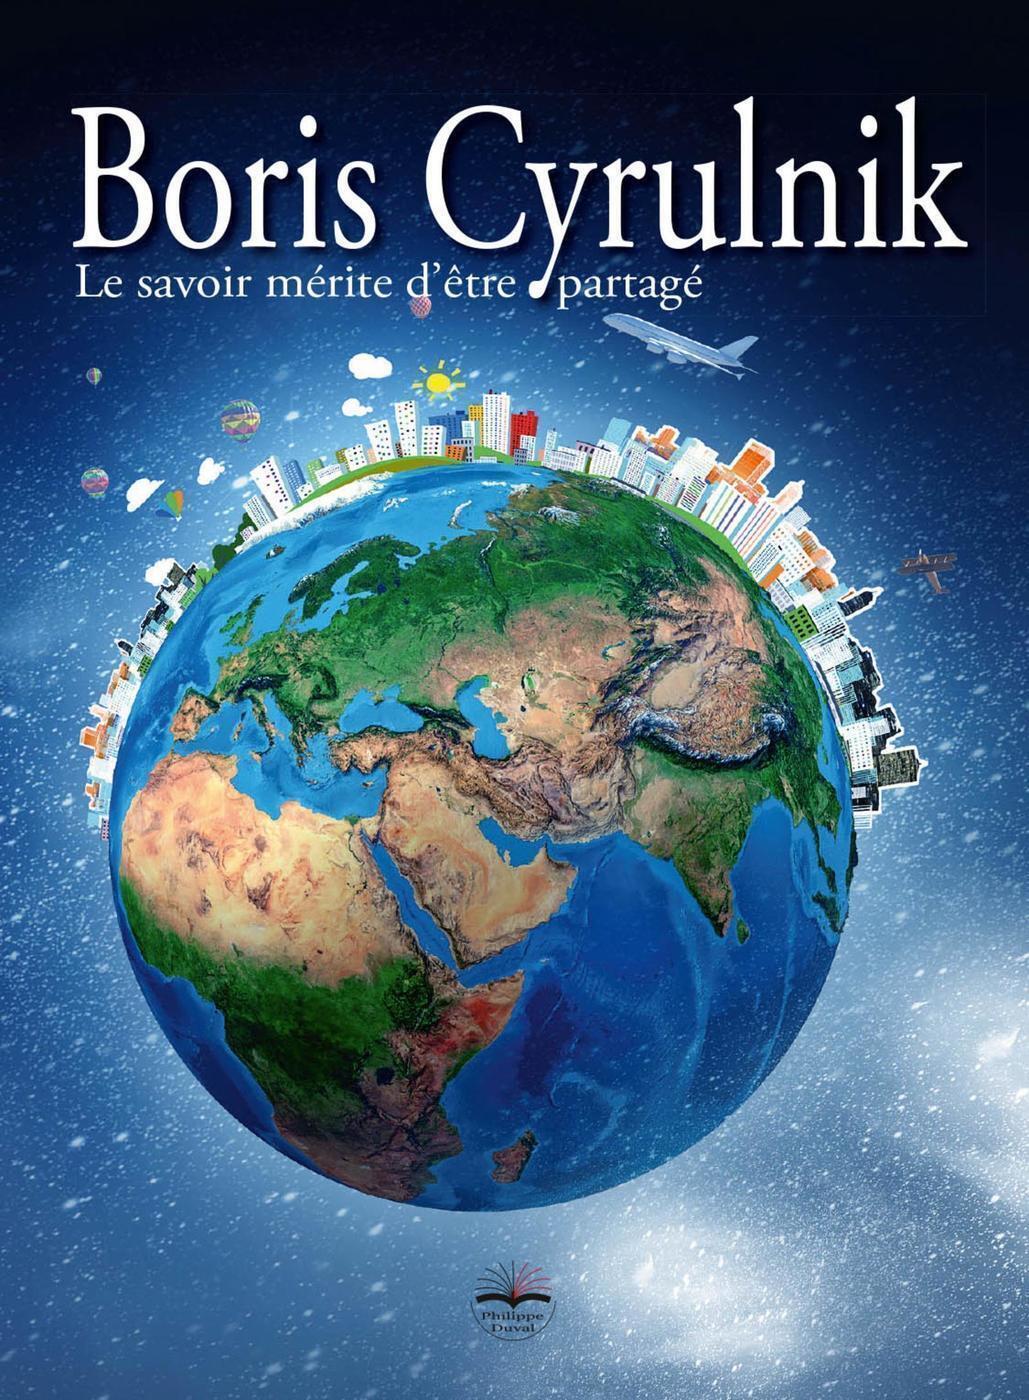 BORIS CYRULNIK - LE SAVOIR MERITE D'ETRE PARTAGE - UN DVD INCLUS. ENTRETIEN AVEC BORIS CYRULNIK